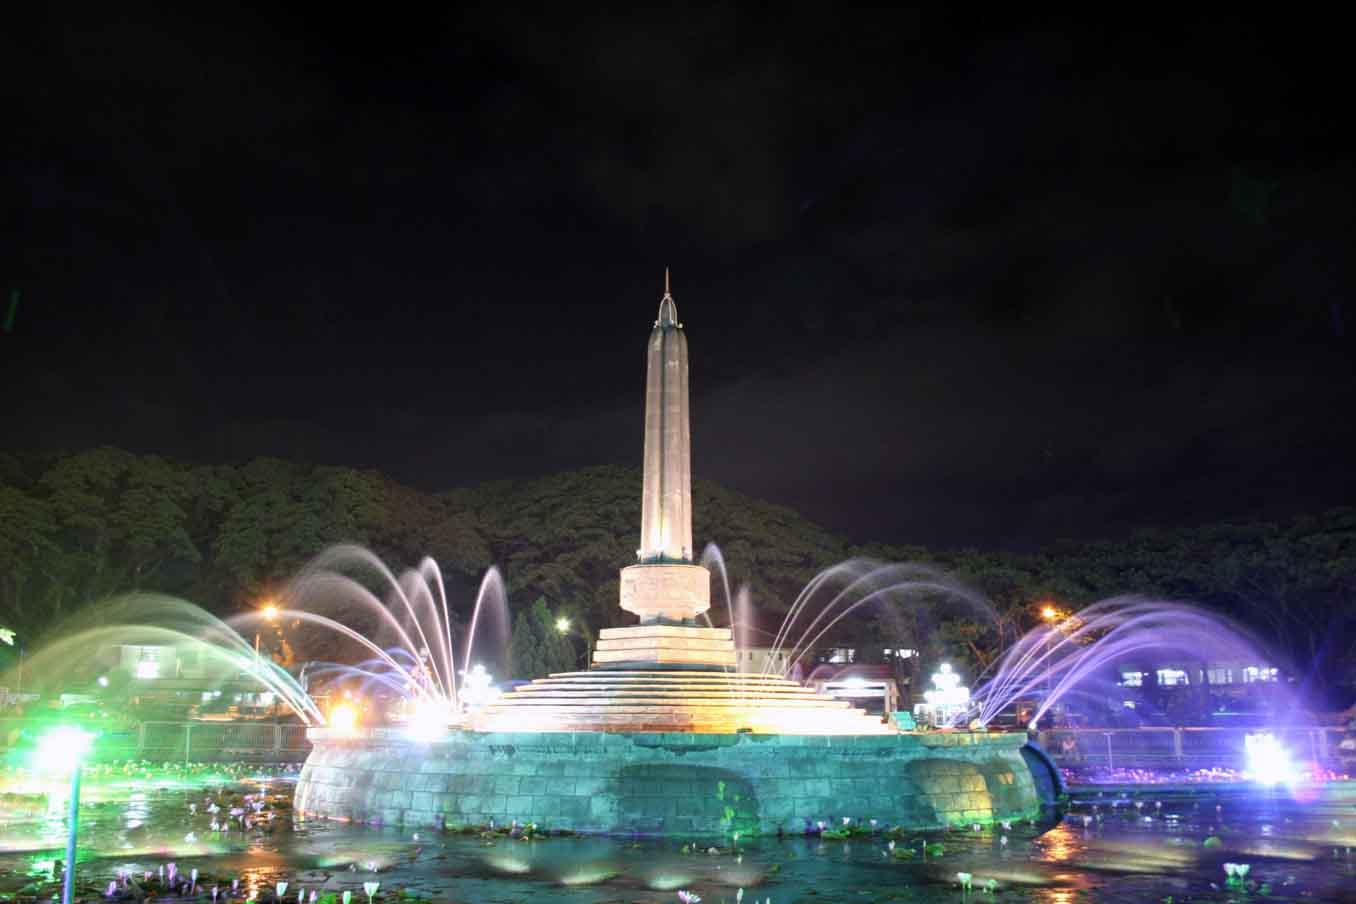 Daftar Nama Daerah Tempat Wisata Malang 2018 Check Langsung Tugu